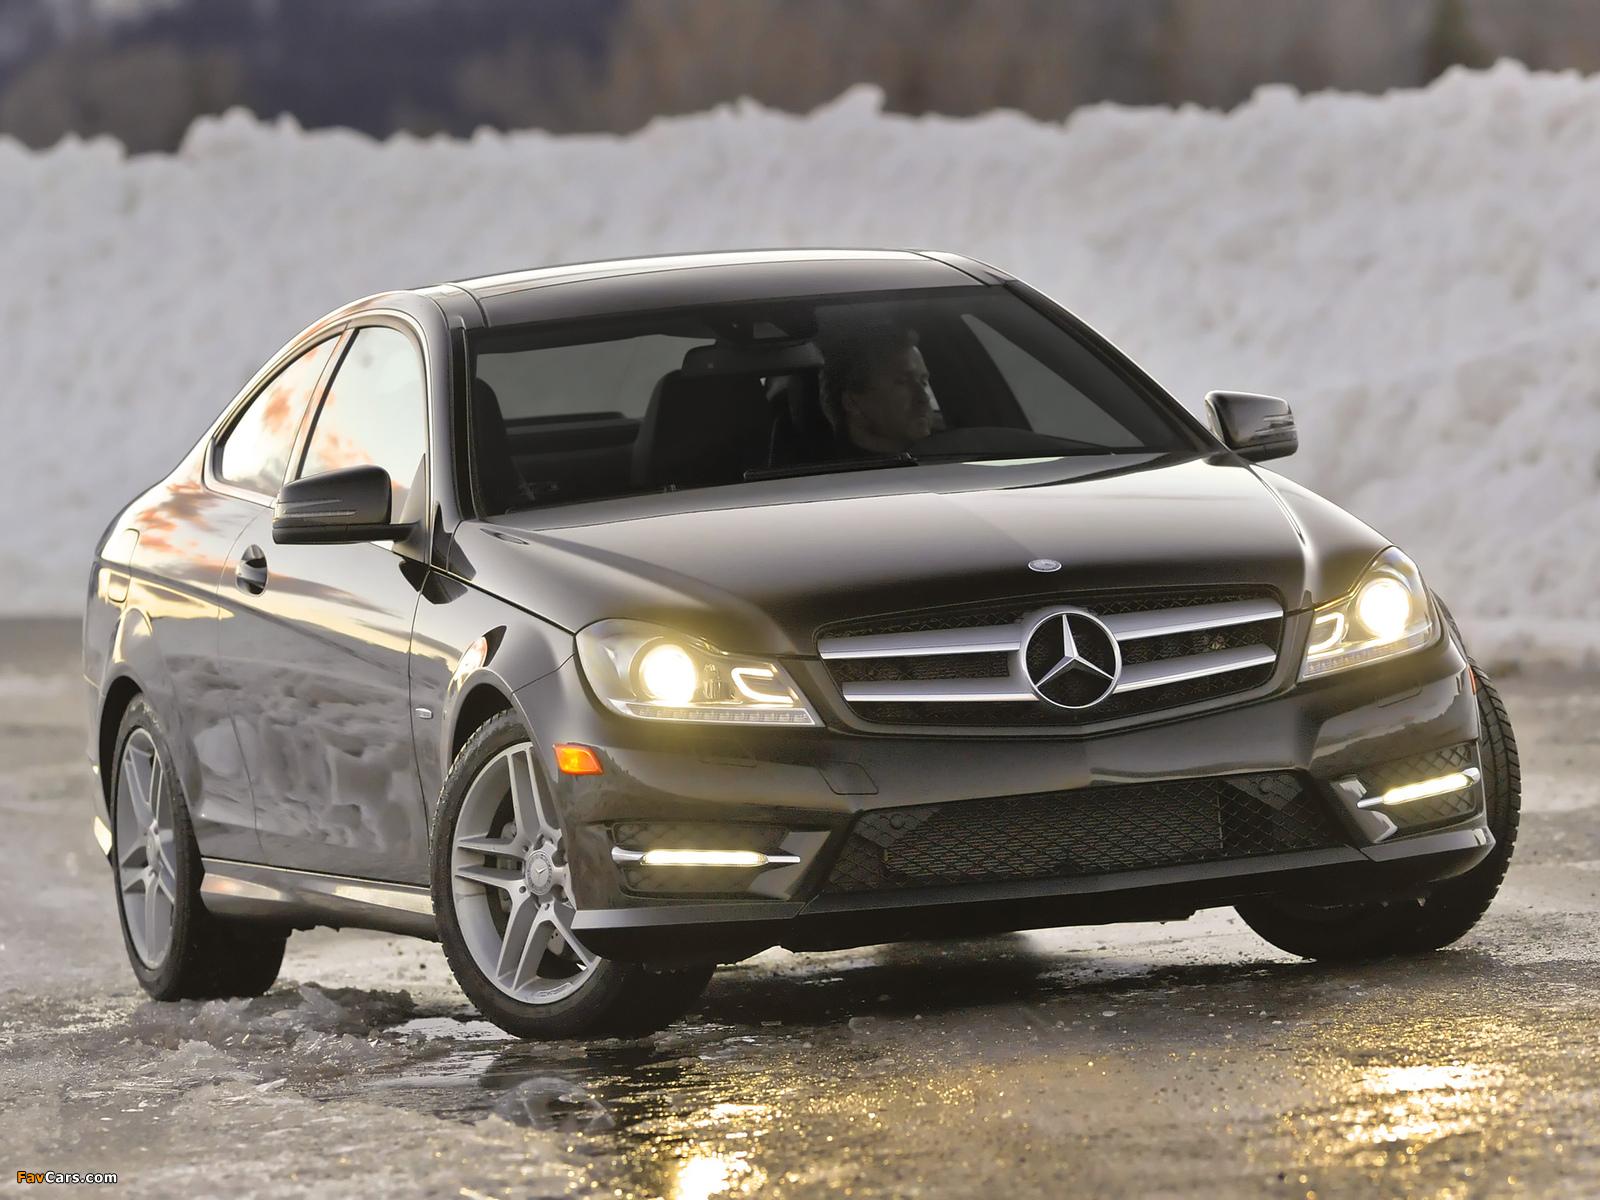 Mercedes-Benz C 350 4MATIC Coupe US-spec (C204) 2011 photos (1600 x 1200)